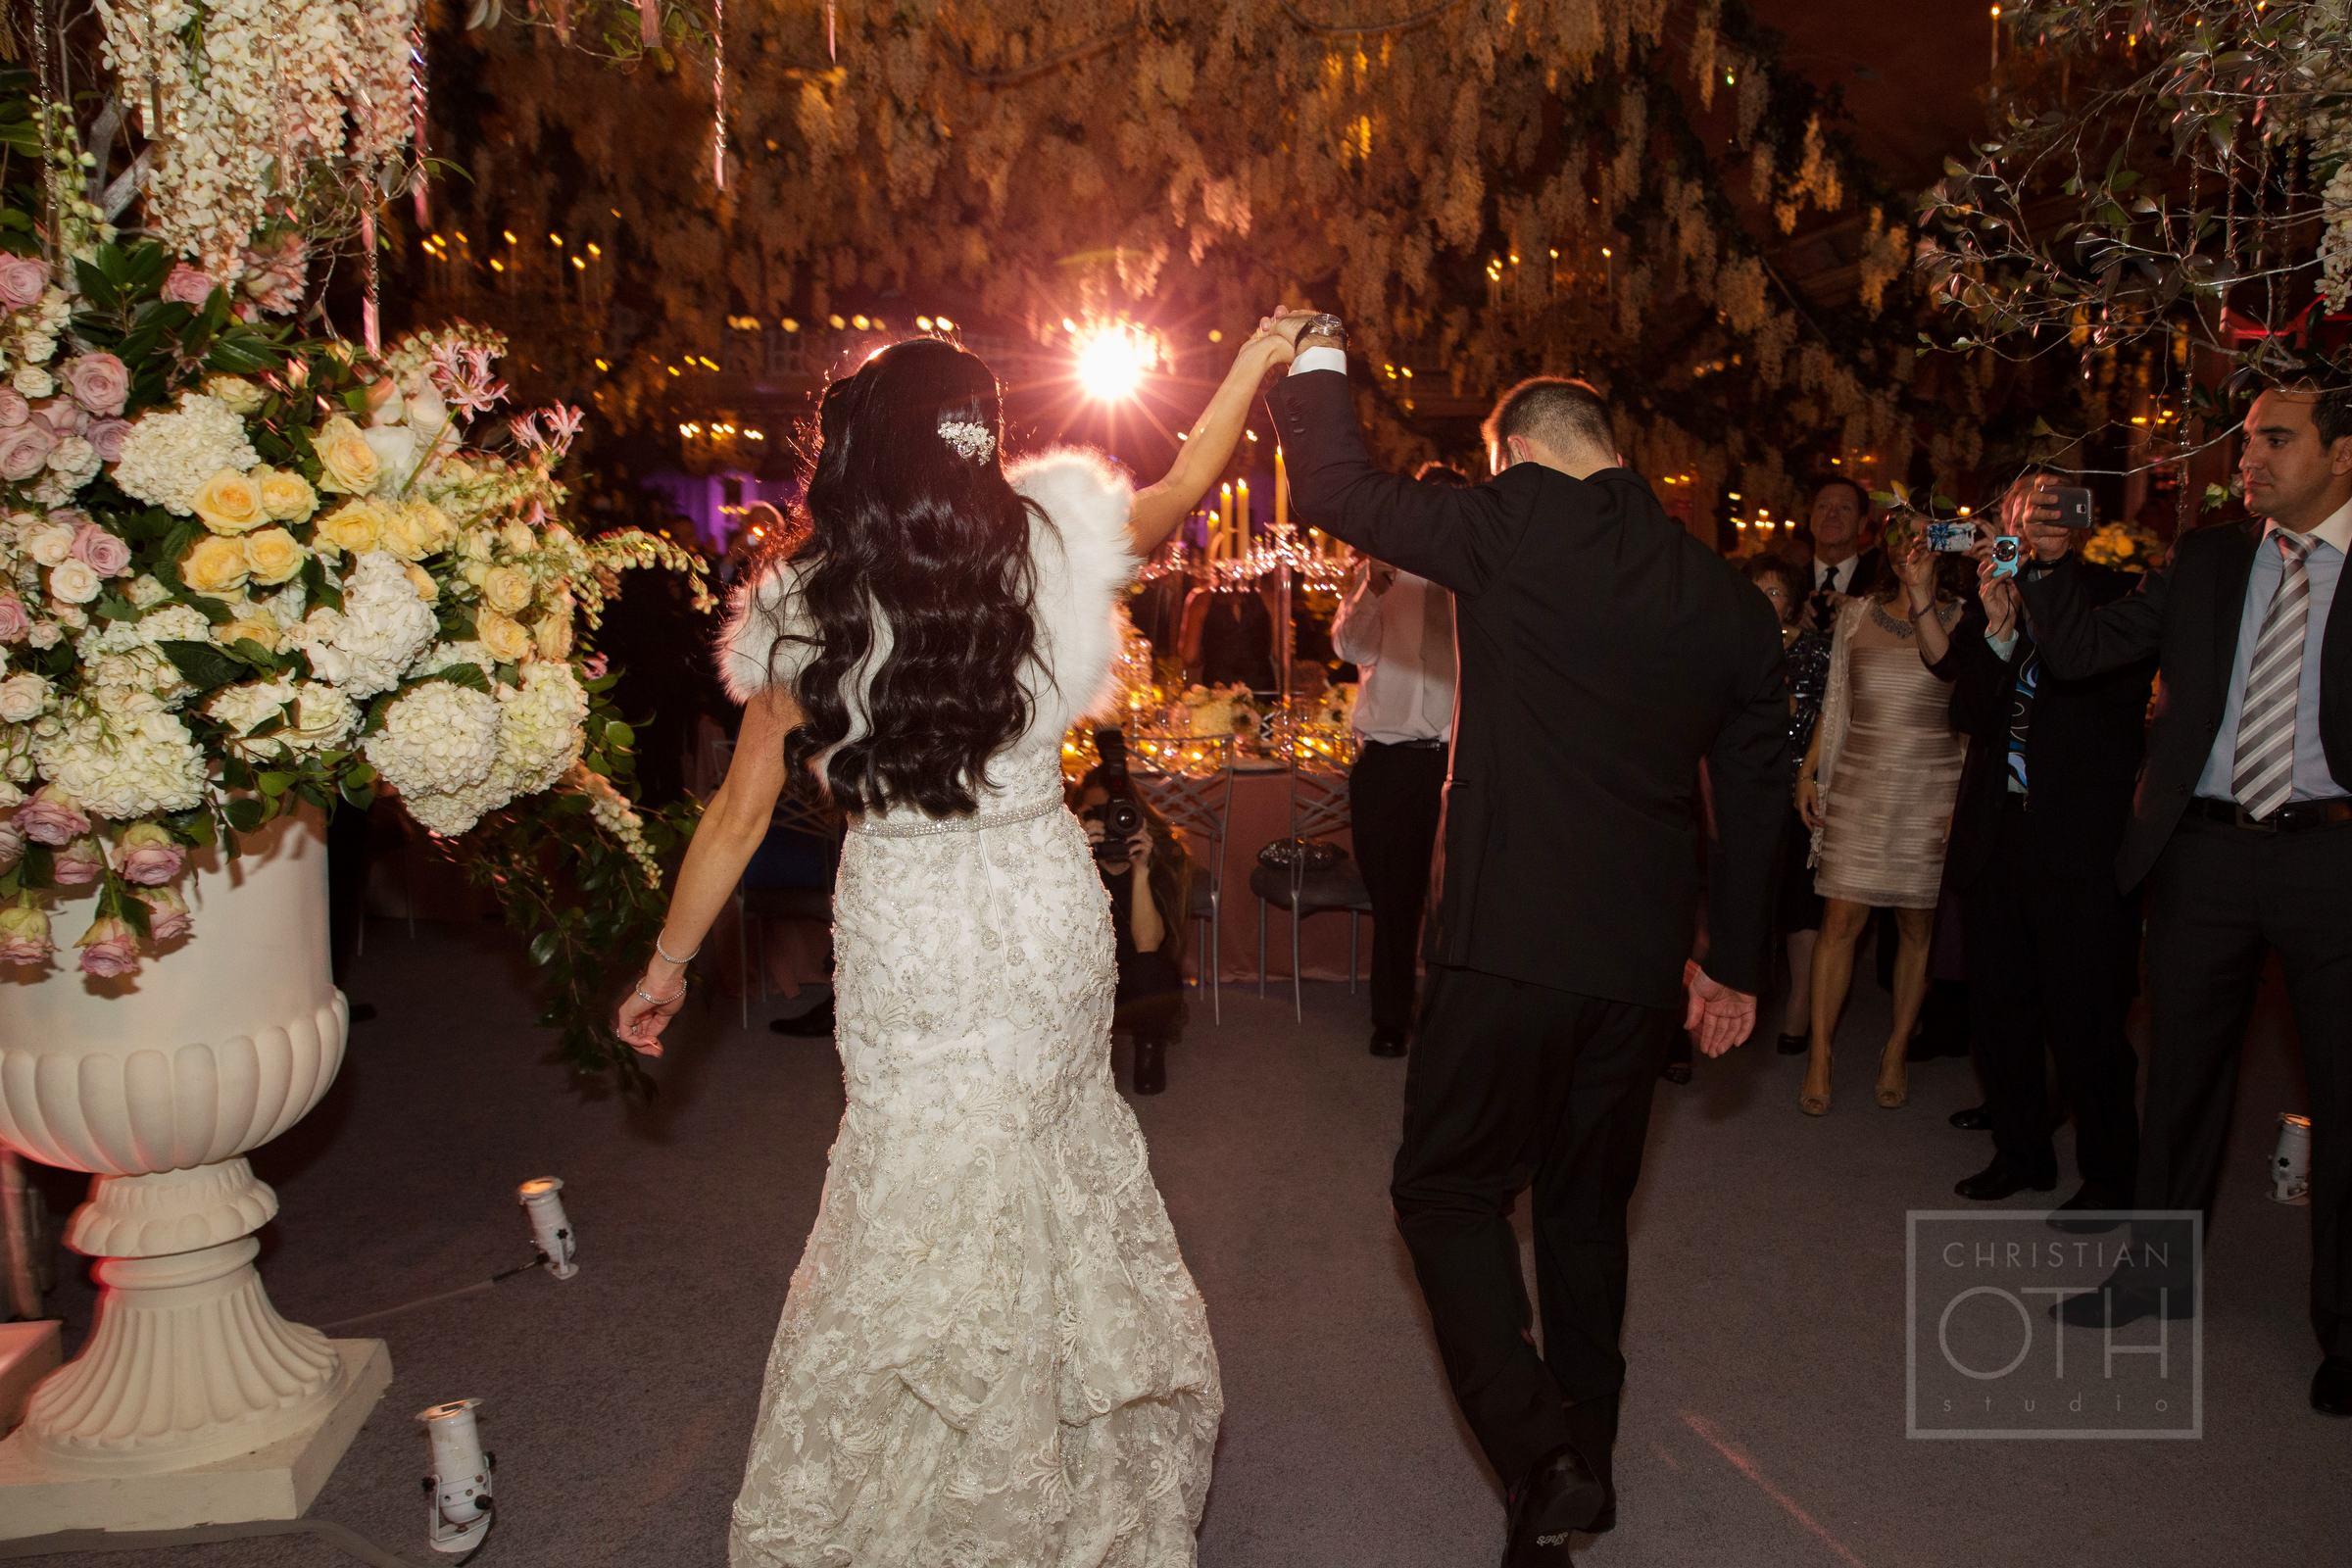 Ceci_New_York_Custom_Invitation_Pierre__City_ Destination_Wedding_Luxury_Personalized_Ceci_Style_Bride_Rose_Gold_Foil_Stamping132.JPG